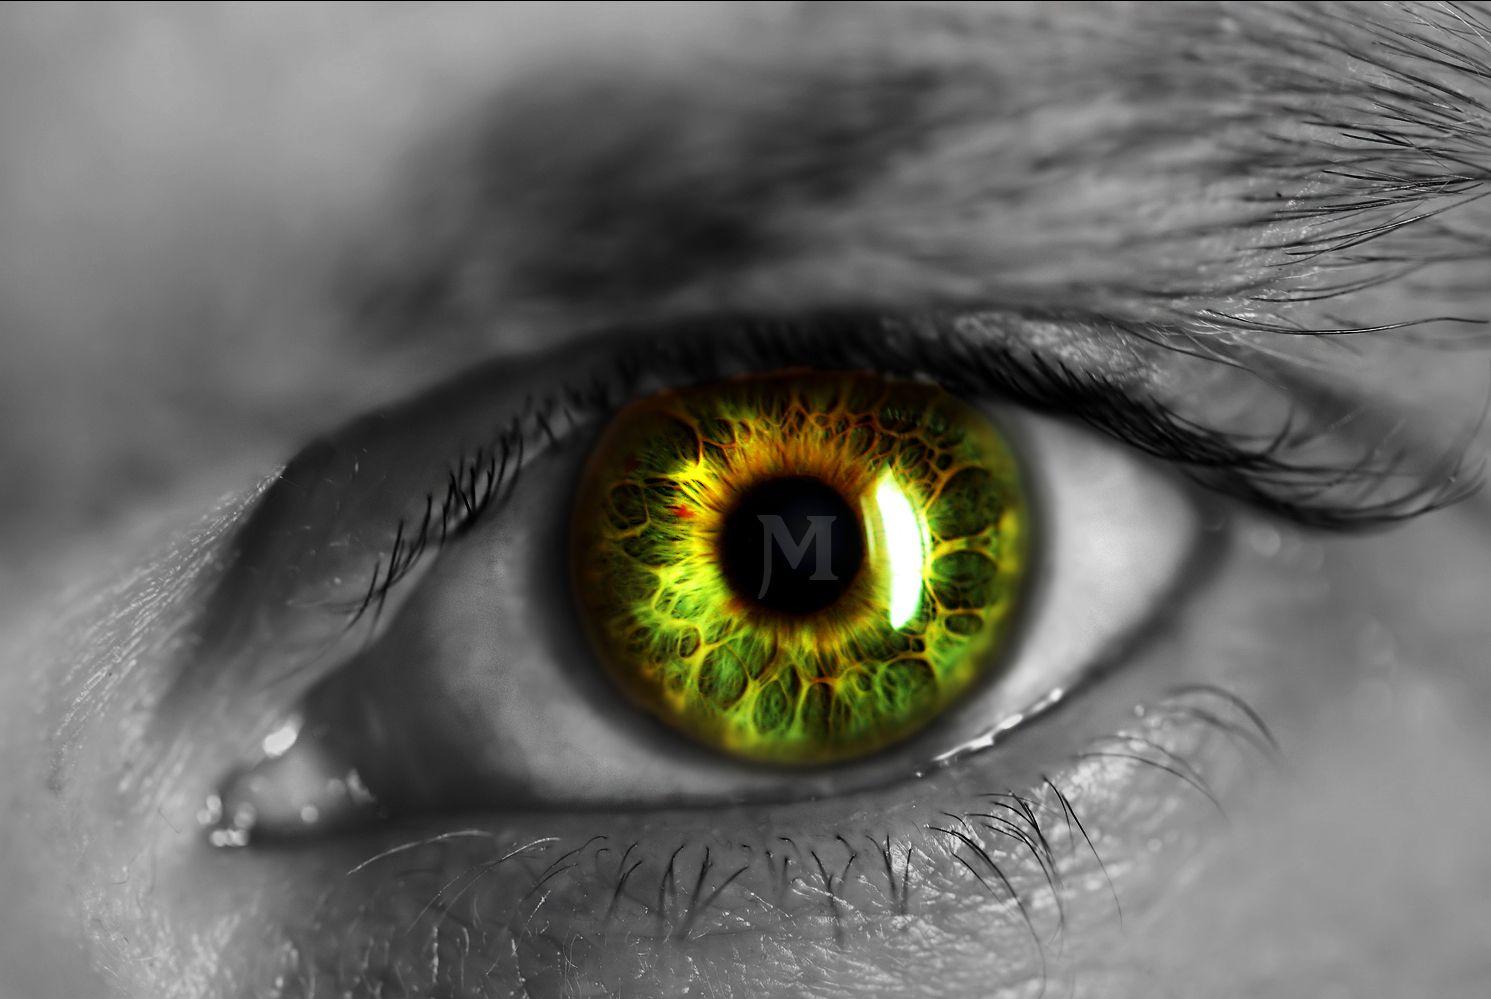 Hd wallpaper man - Men Eye Maria Horta Green Man Light Rays Dark Hd Maria Wallpaper